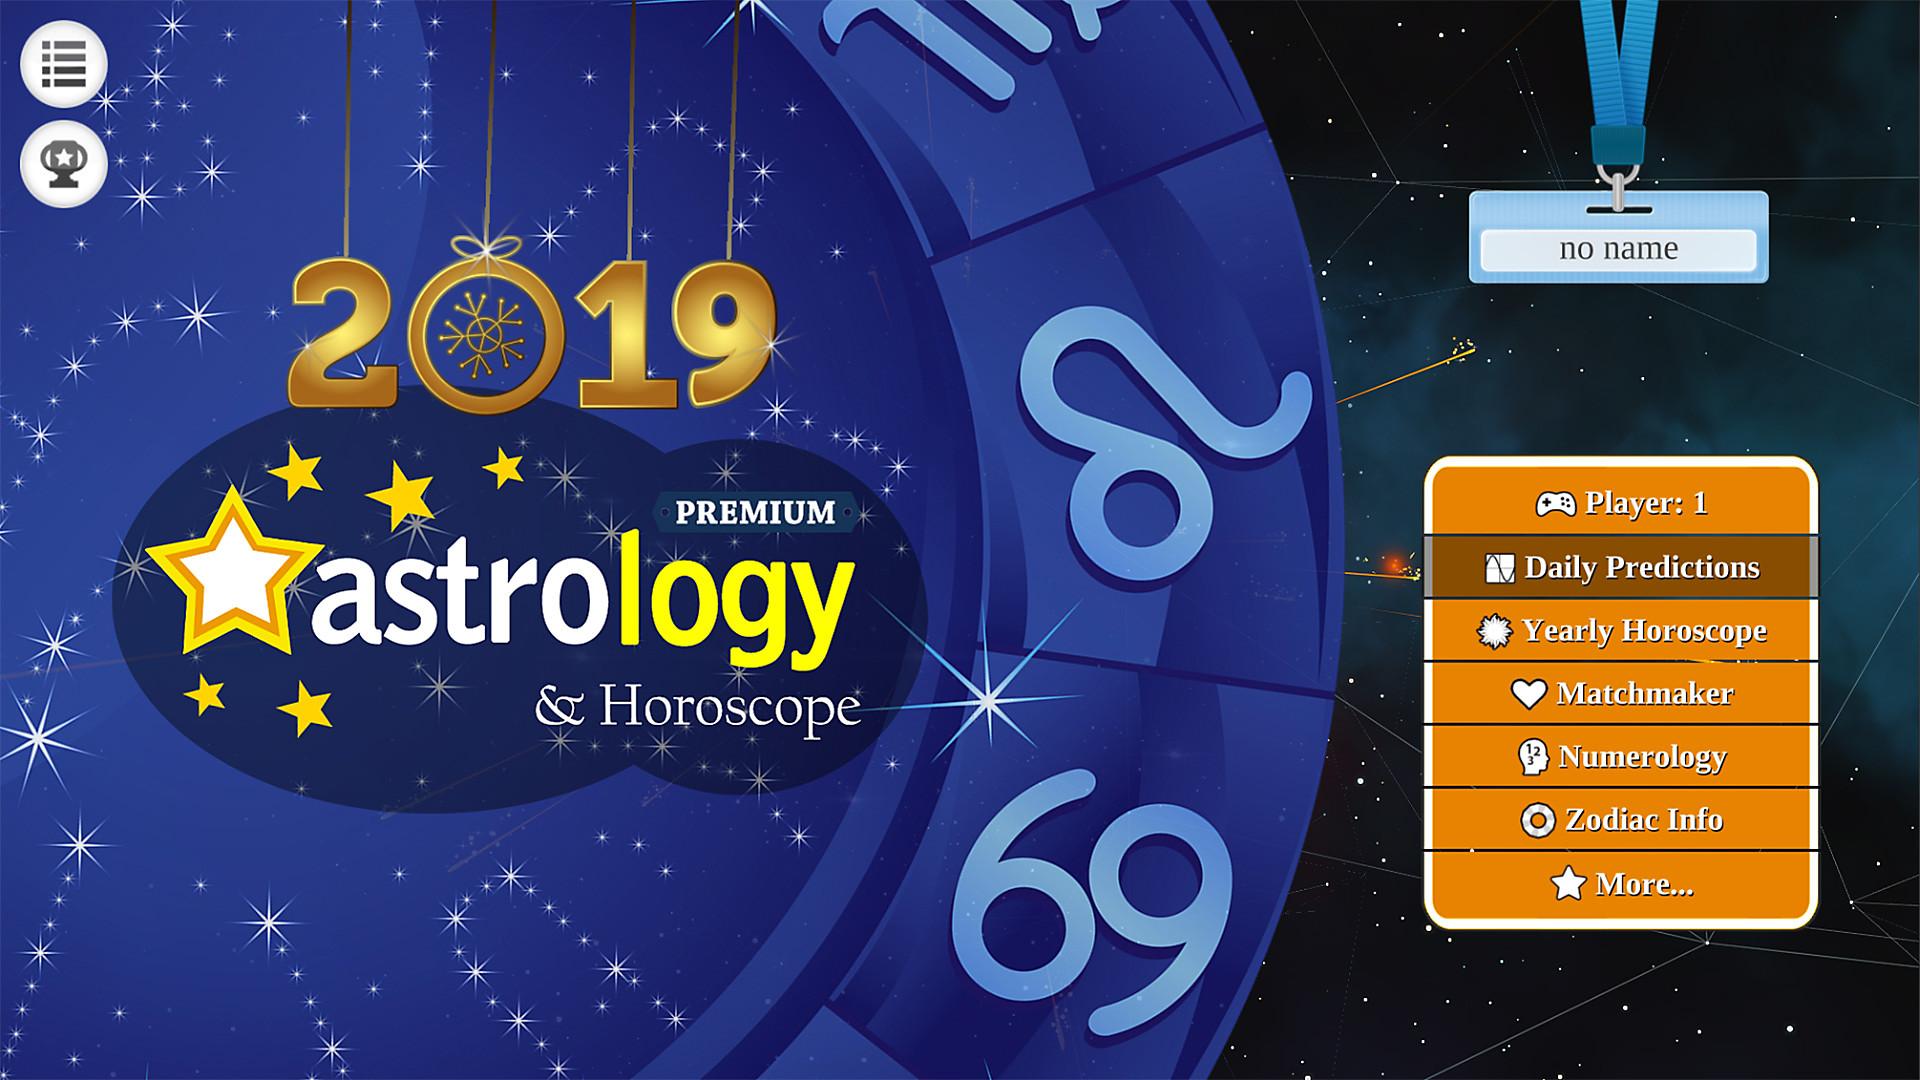 Matchmaker astrology